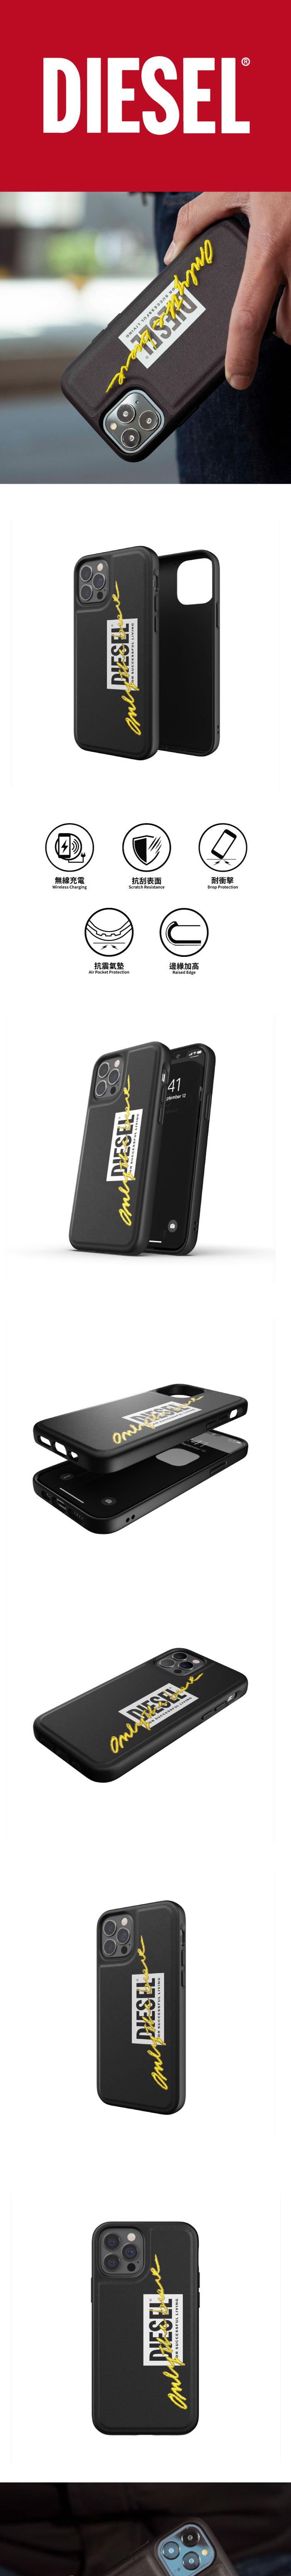 Diesel|iPhone 12 Pro Max 手機殼 經典刺繡